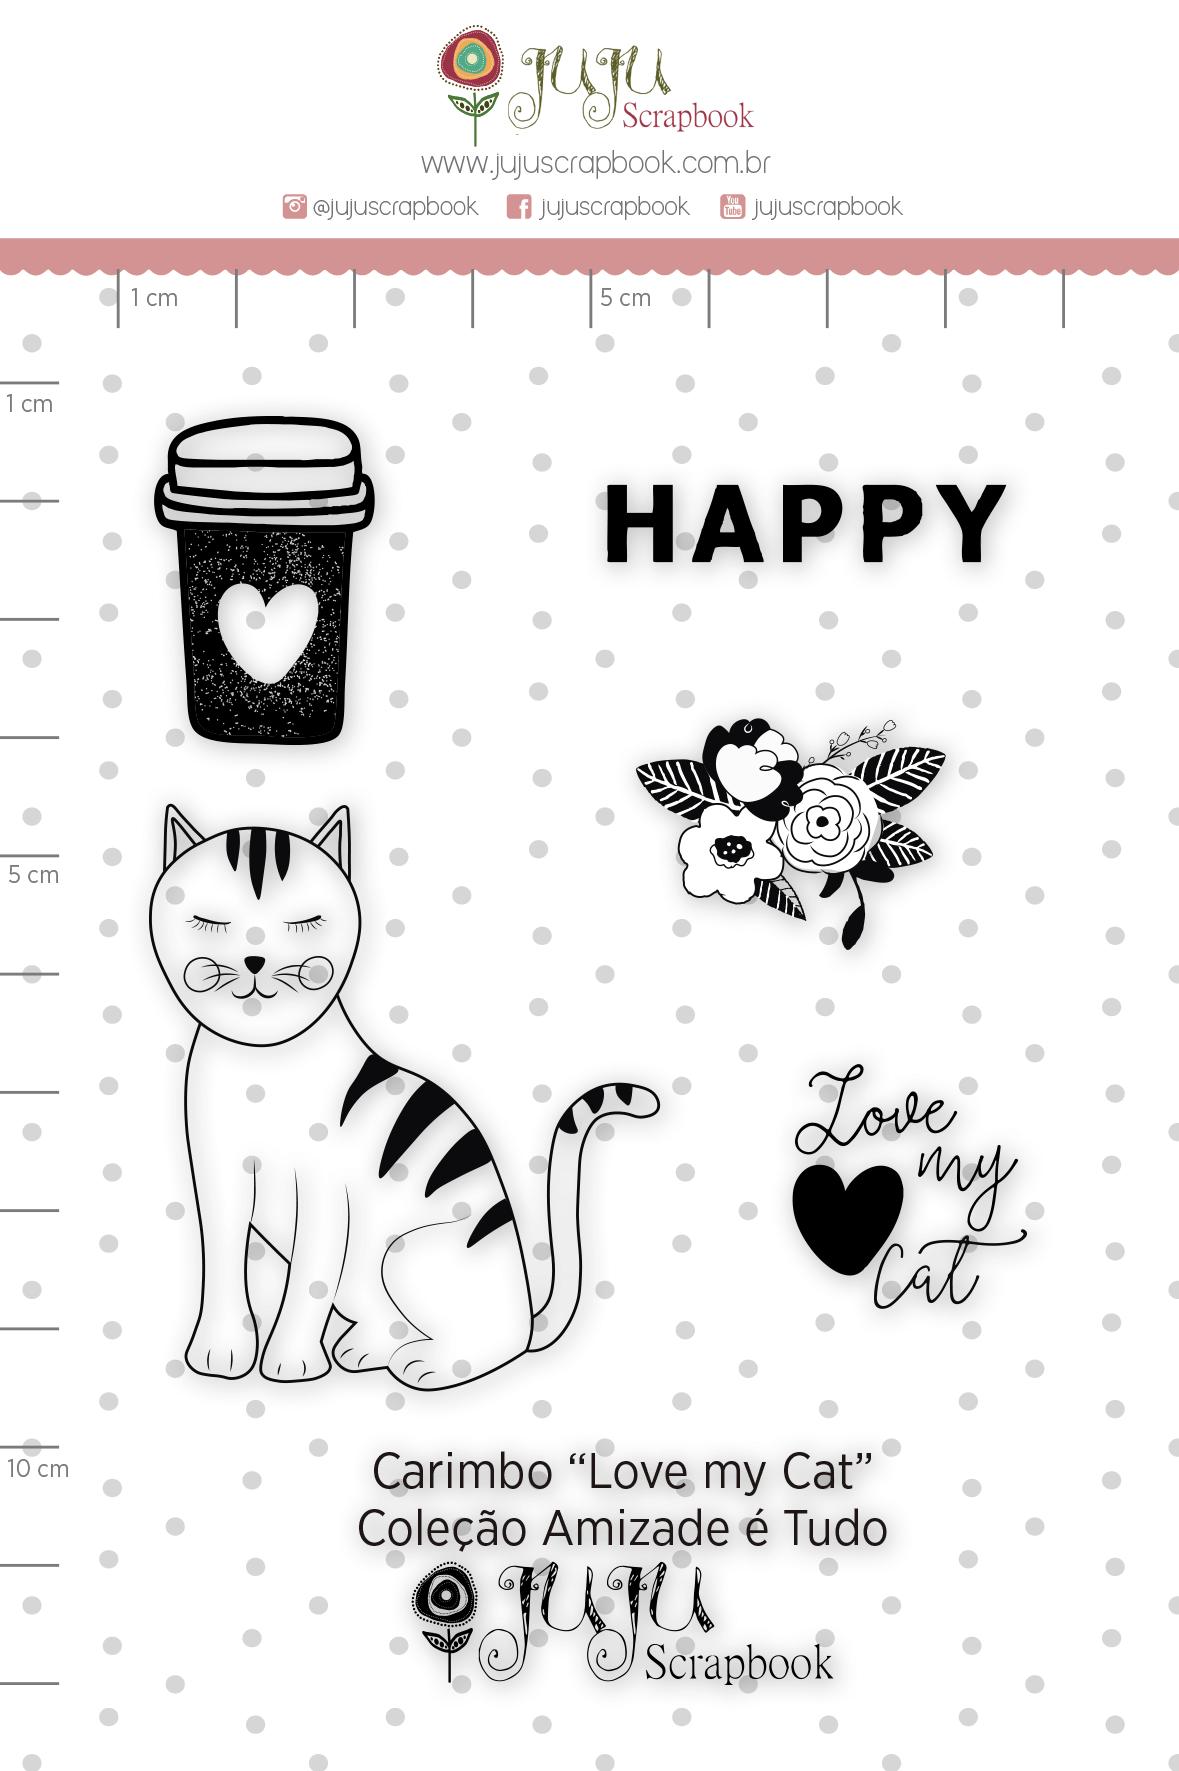 Carimbo G Love my Cat - Coleção Amizade é Tudo - JuJu Scrapbook  - JuJu Scrapbook